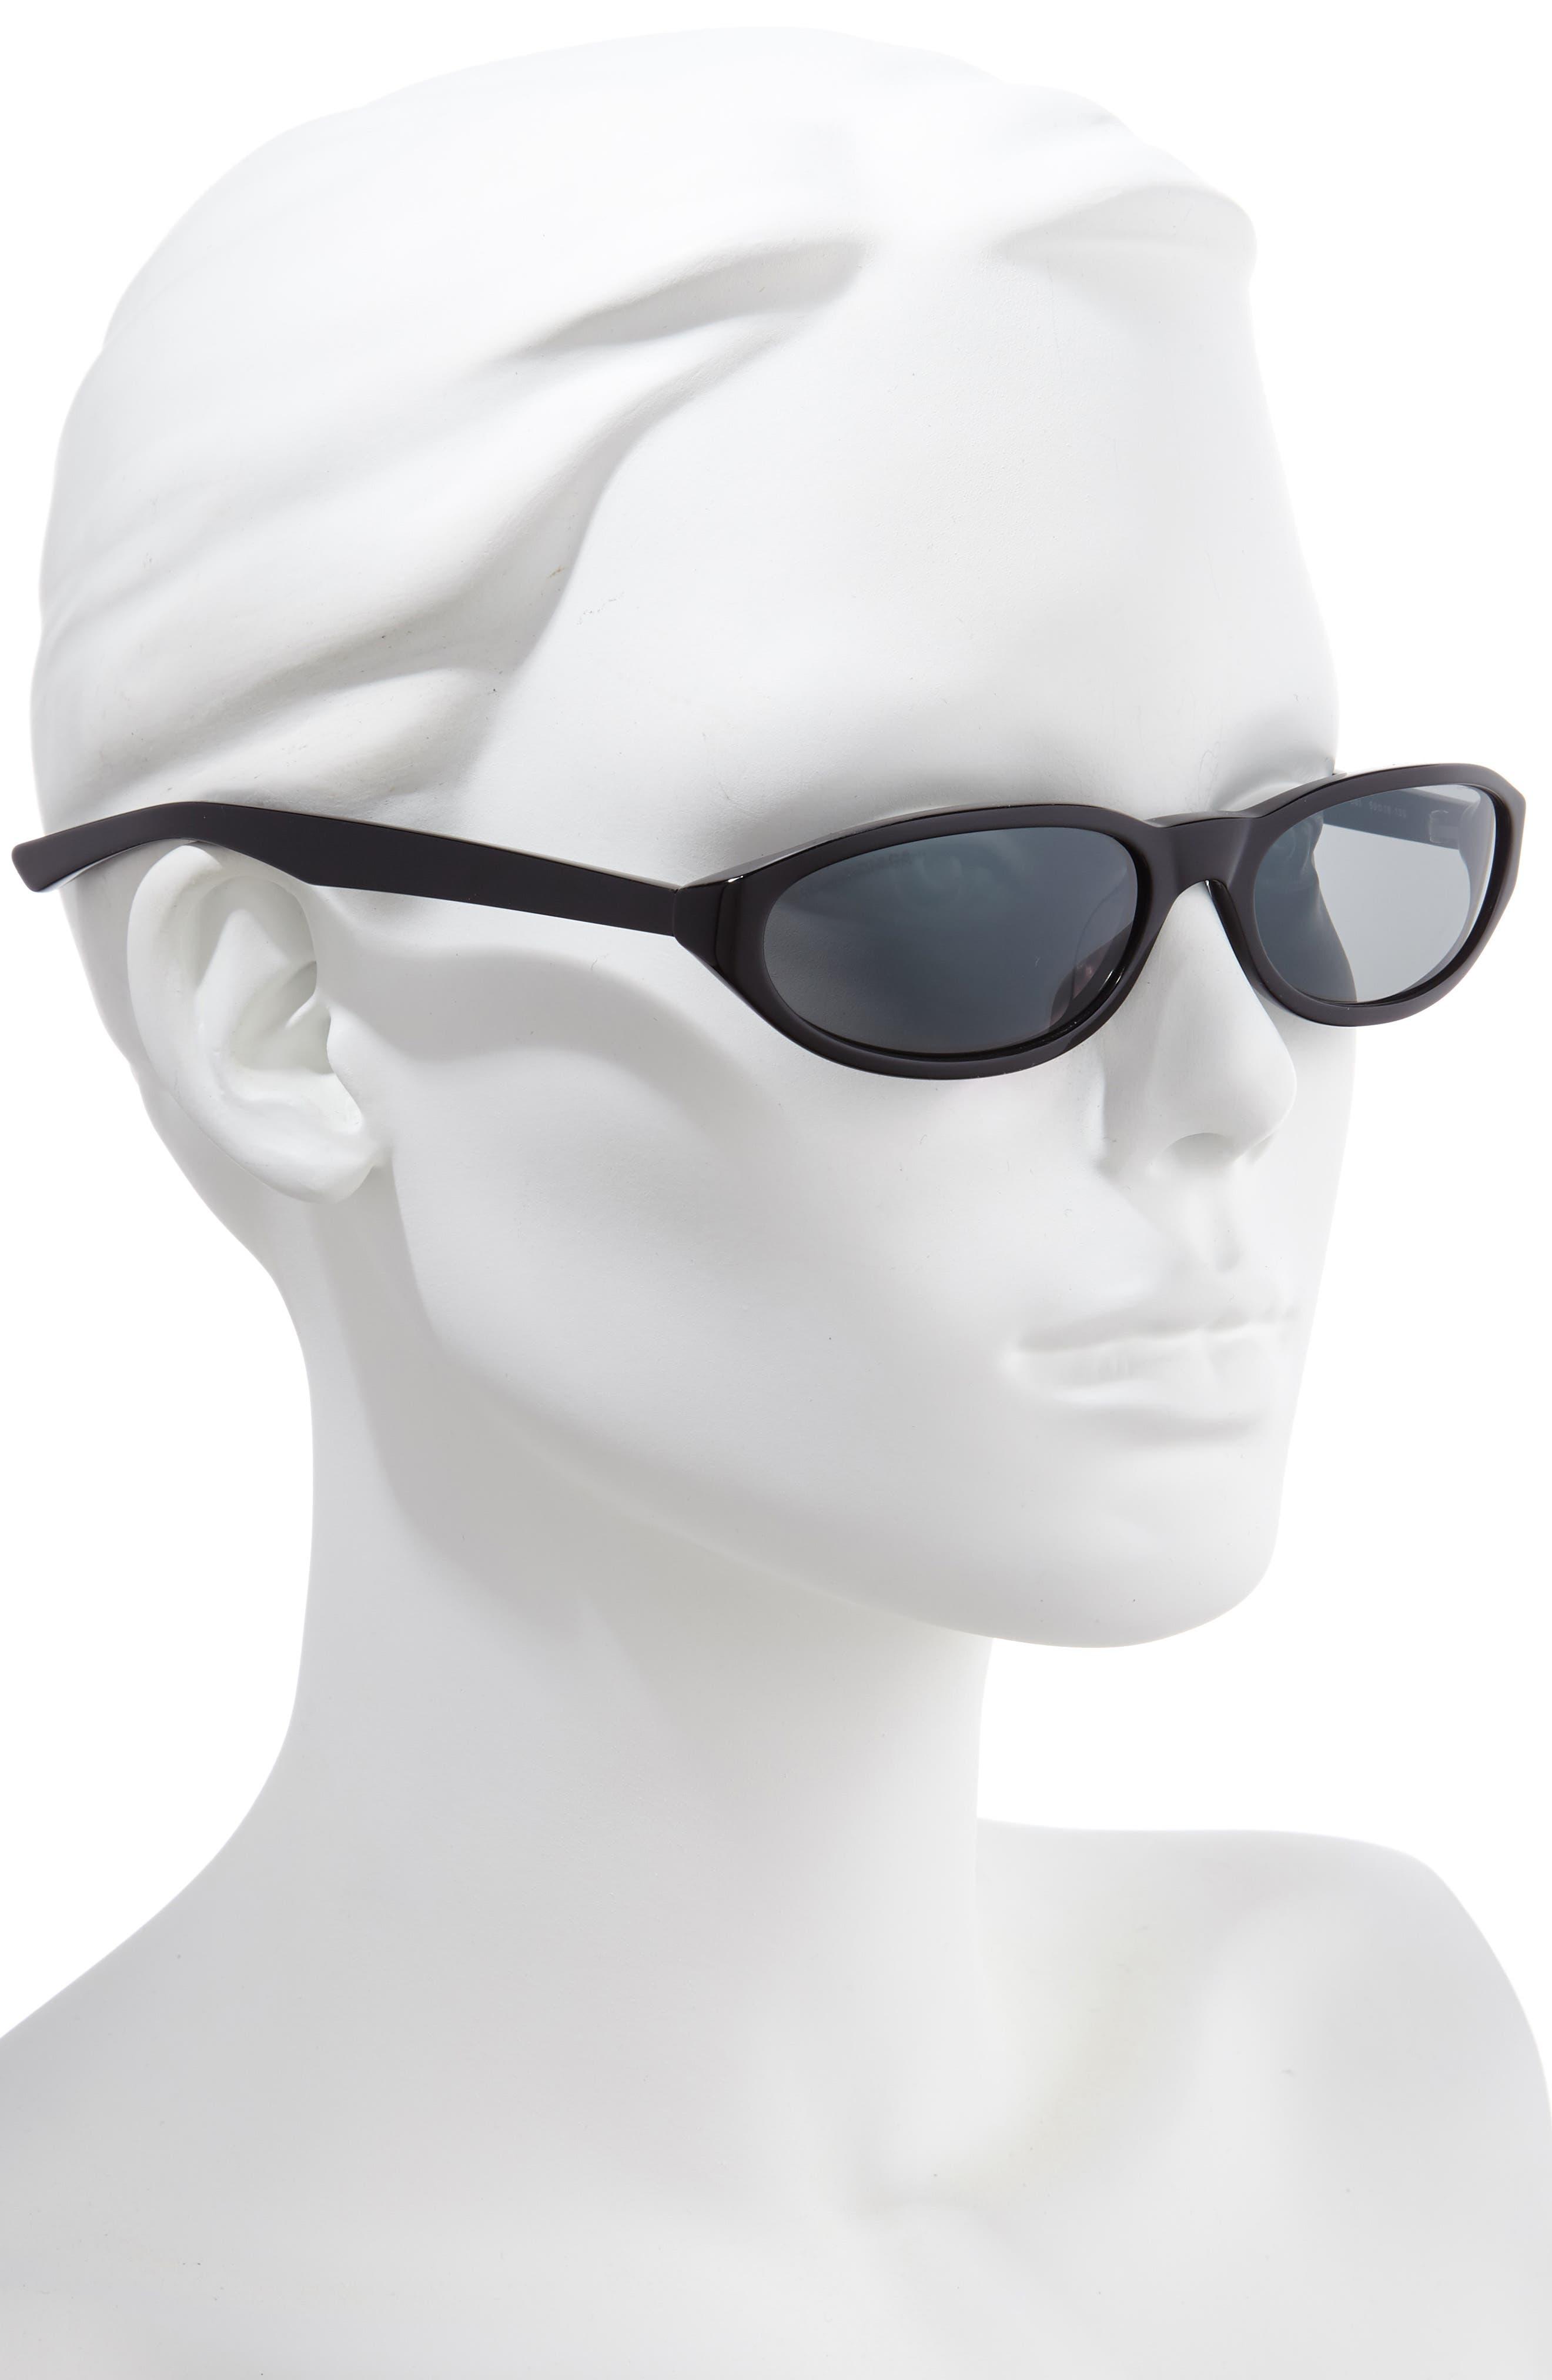 BALENCIAGA, 59mm Cateye Sunglasses, Alternate thumbnail 2, color, SHINY BLACK/ GREY